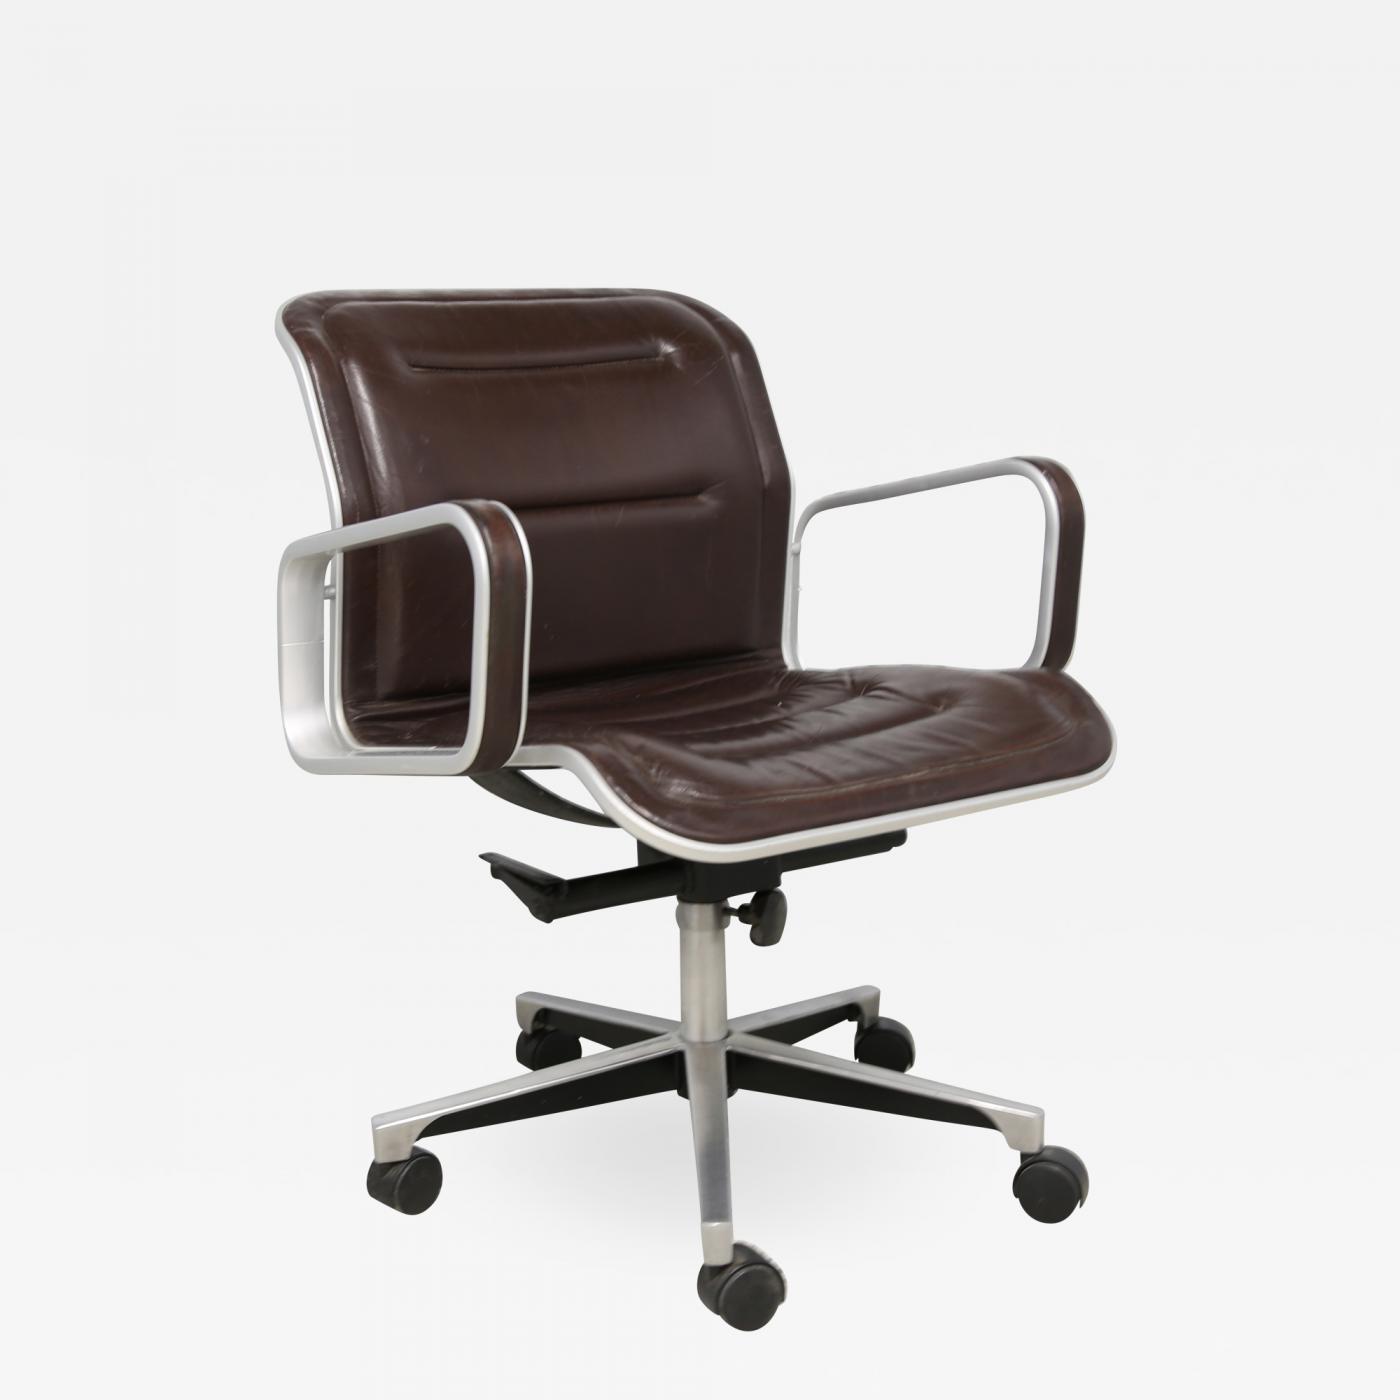 Fine Ring Mekanikk Norway Aluminum And Leather Swivel Desk Chair Pdpeps Interior Chair Design Pdpepsorg